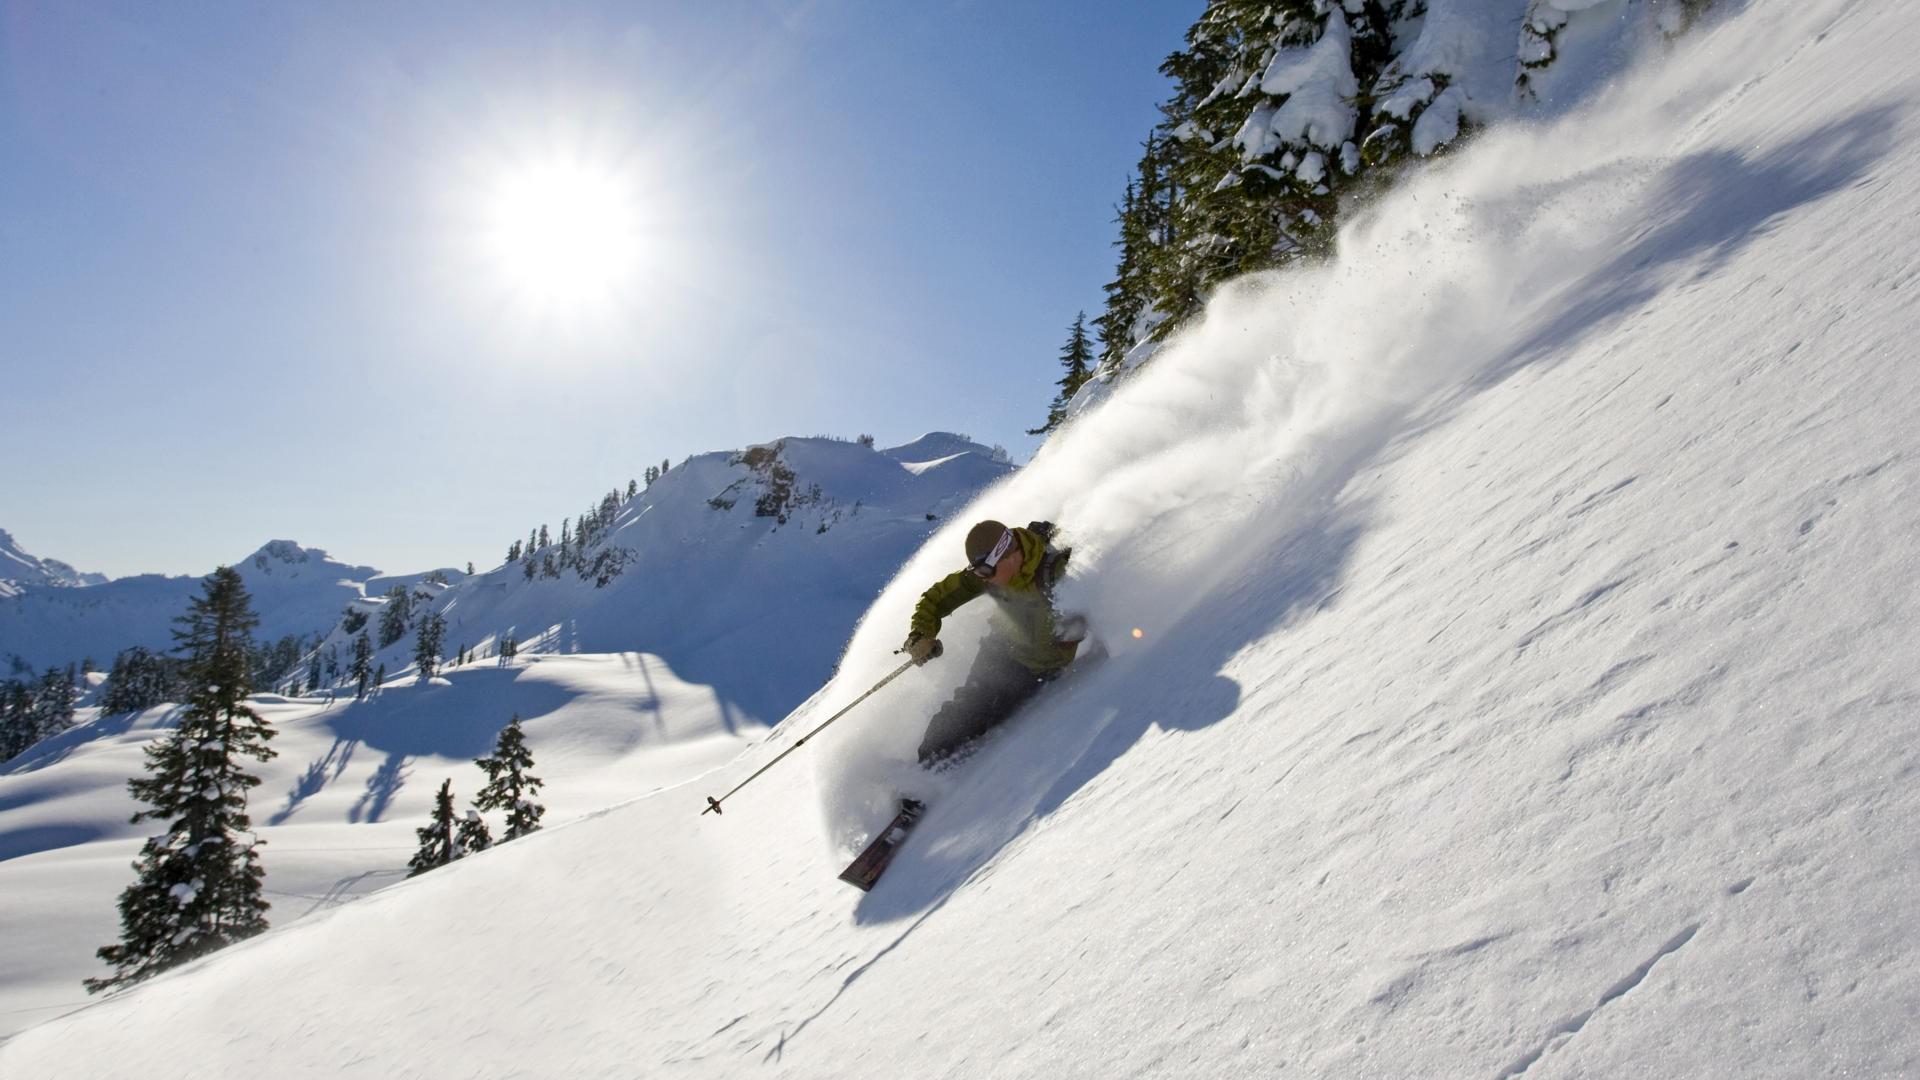 Skiing hd wallpaper background image 1920x1080 id - Ski wallpaper ...